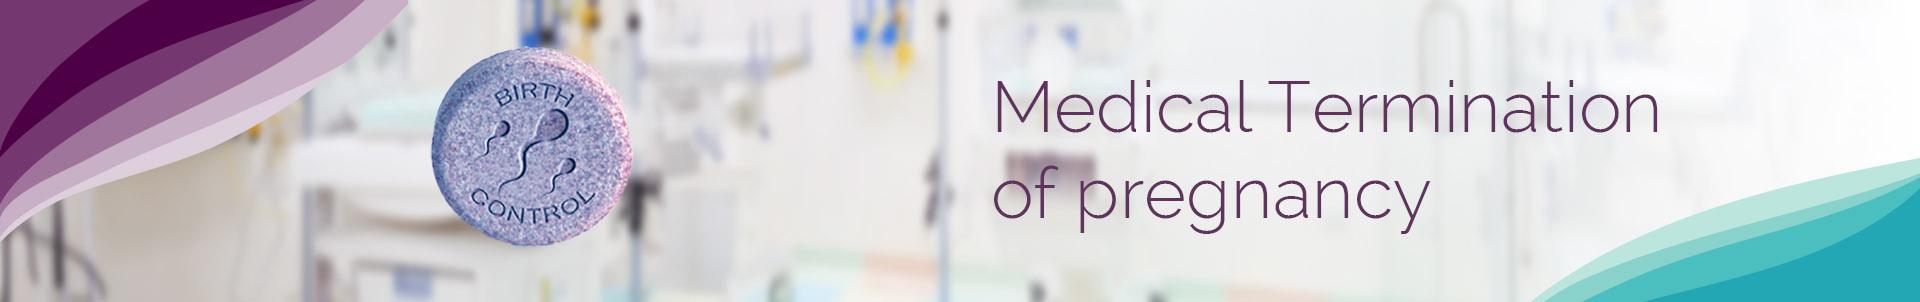 Medical Termination-of Pregnancy at Apollo Cradle